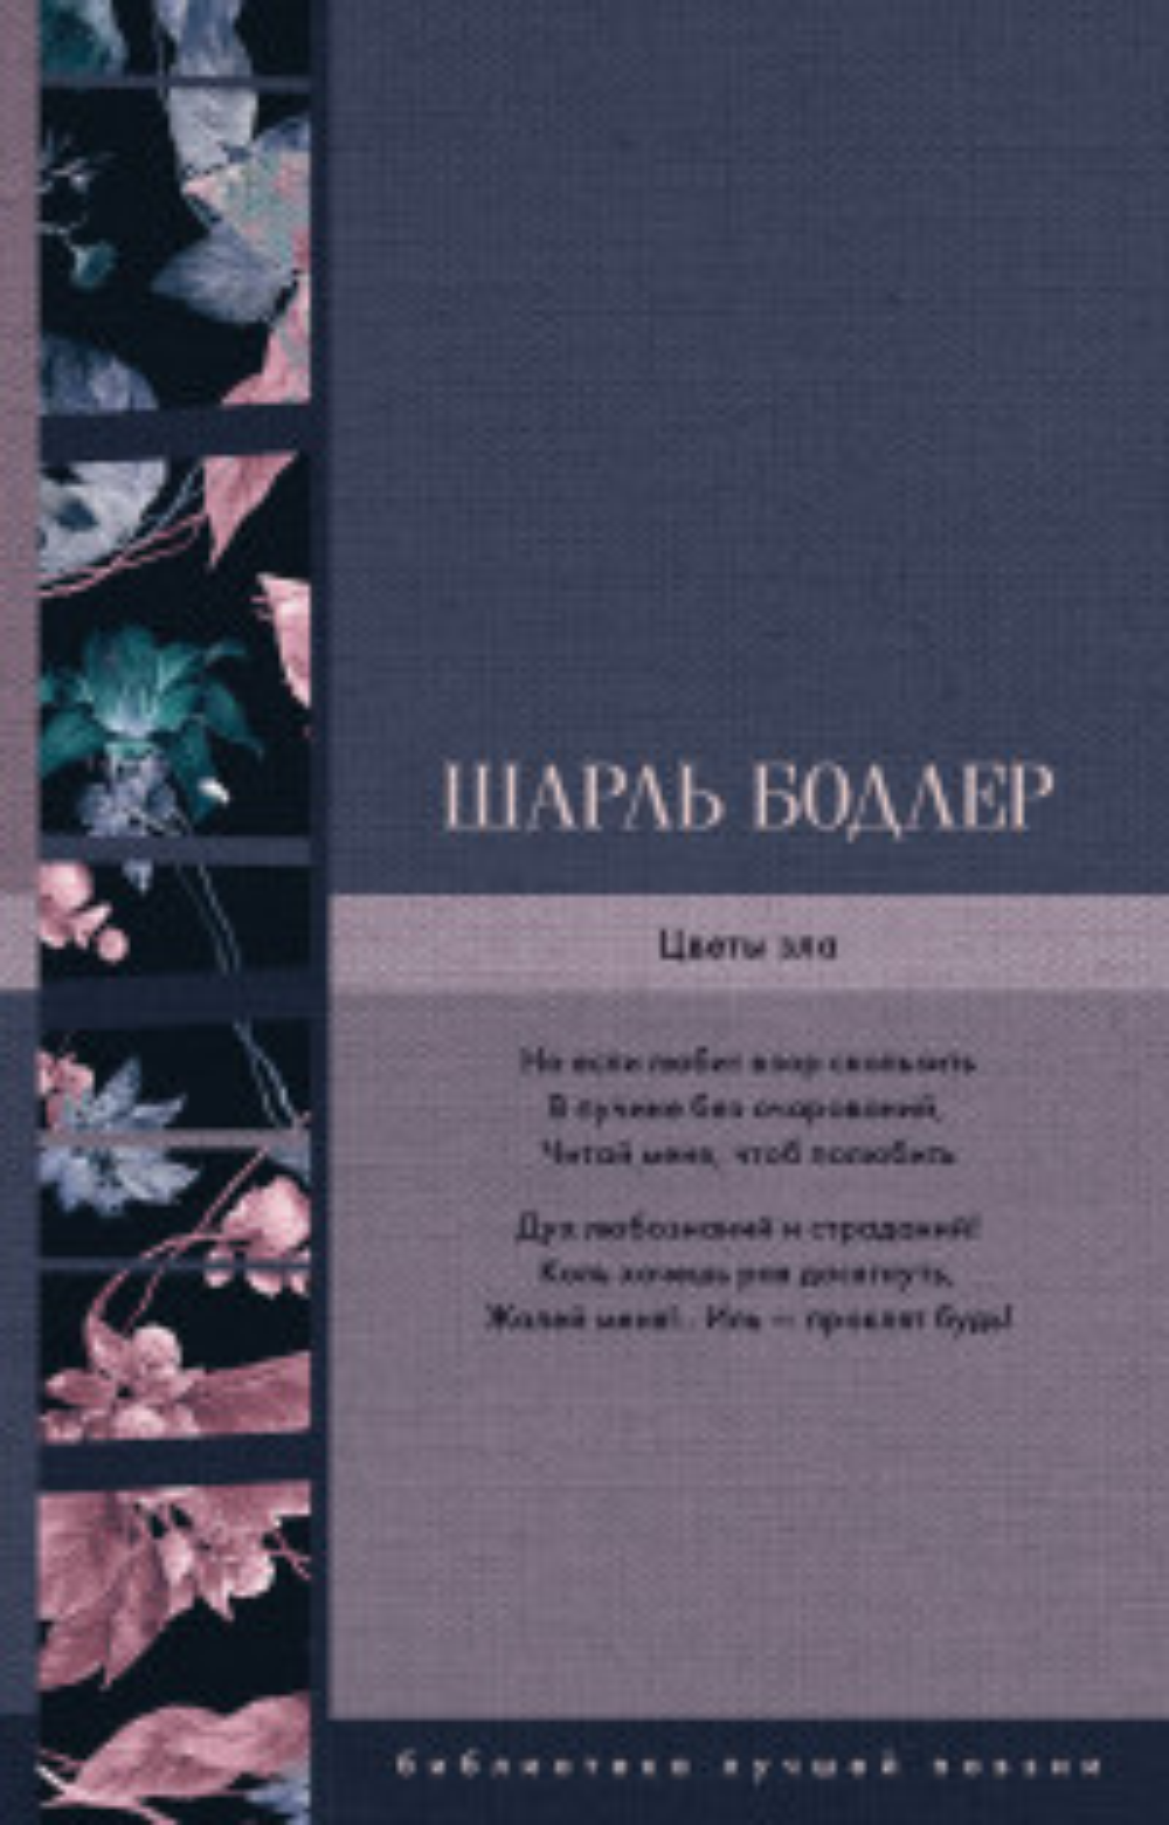 Цветы зла: Сборник стихотворений